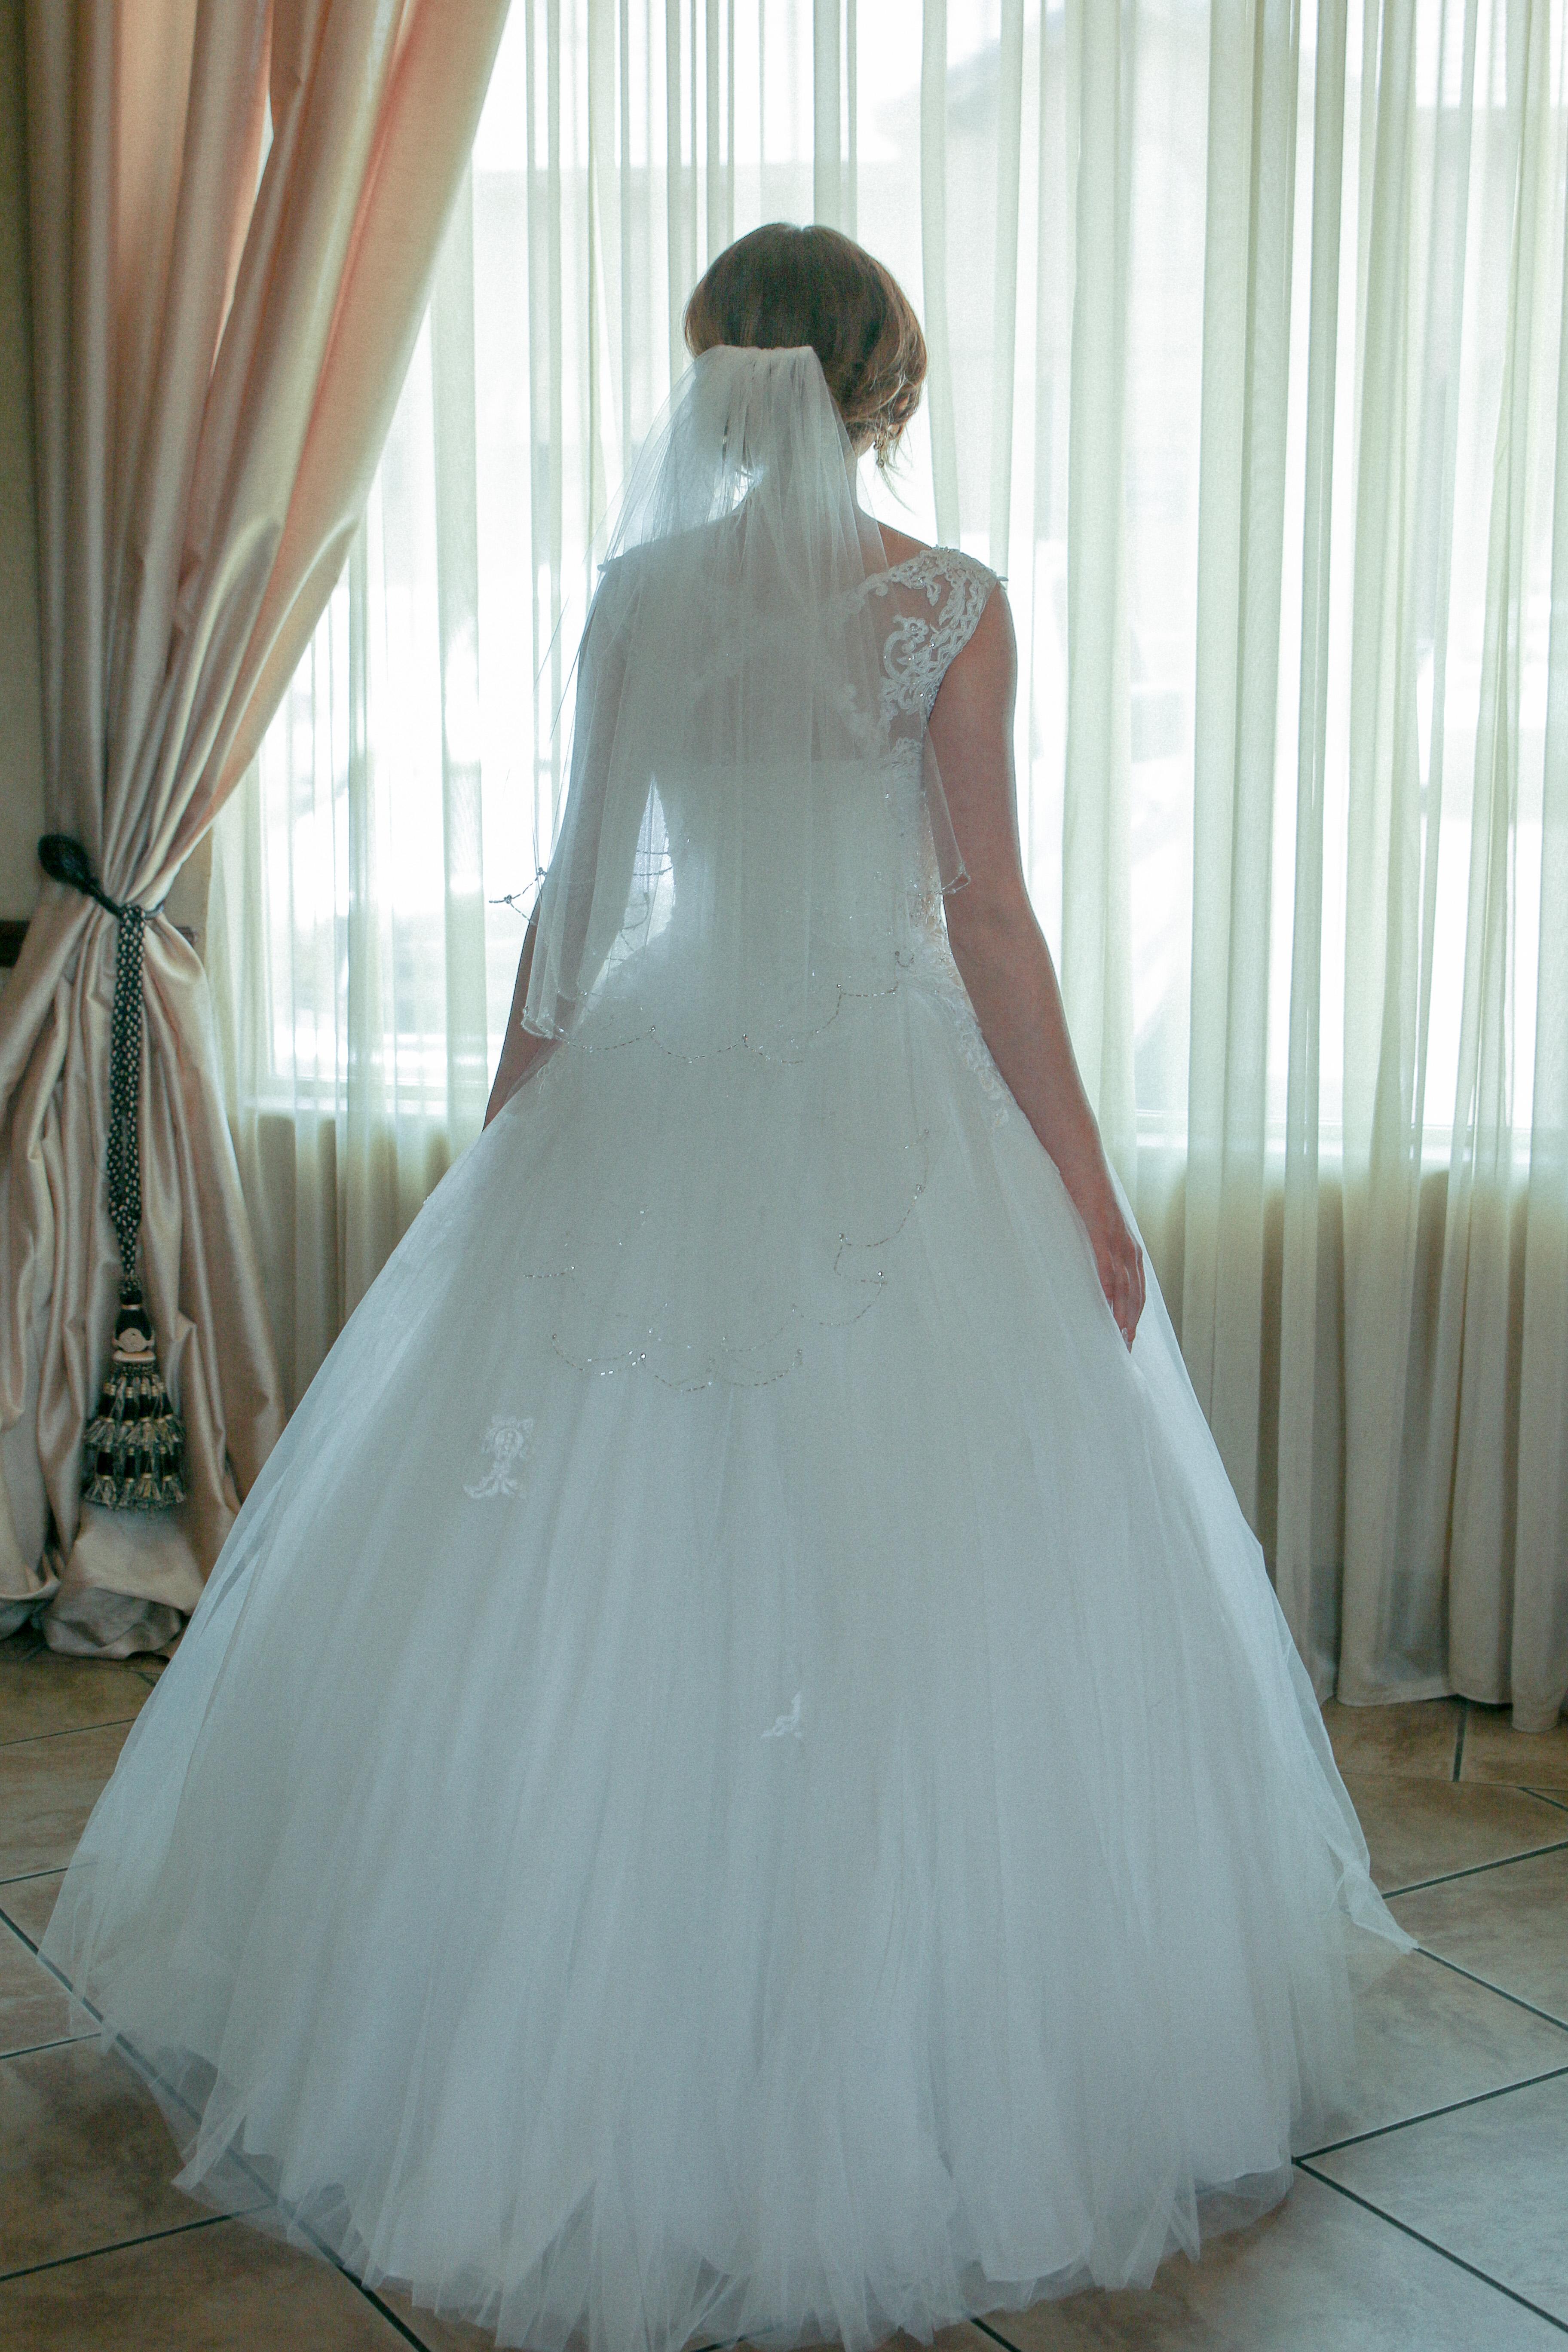 Wedding Dresses | Bell Tower Bridal | Bridal Stores | St George UT ...